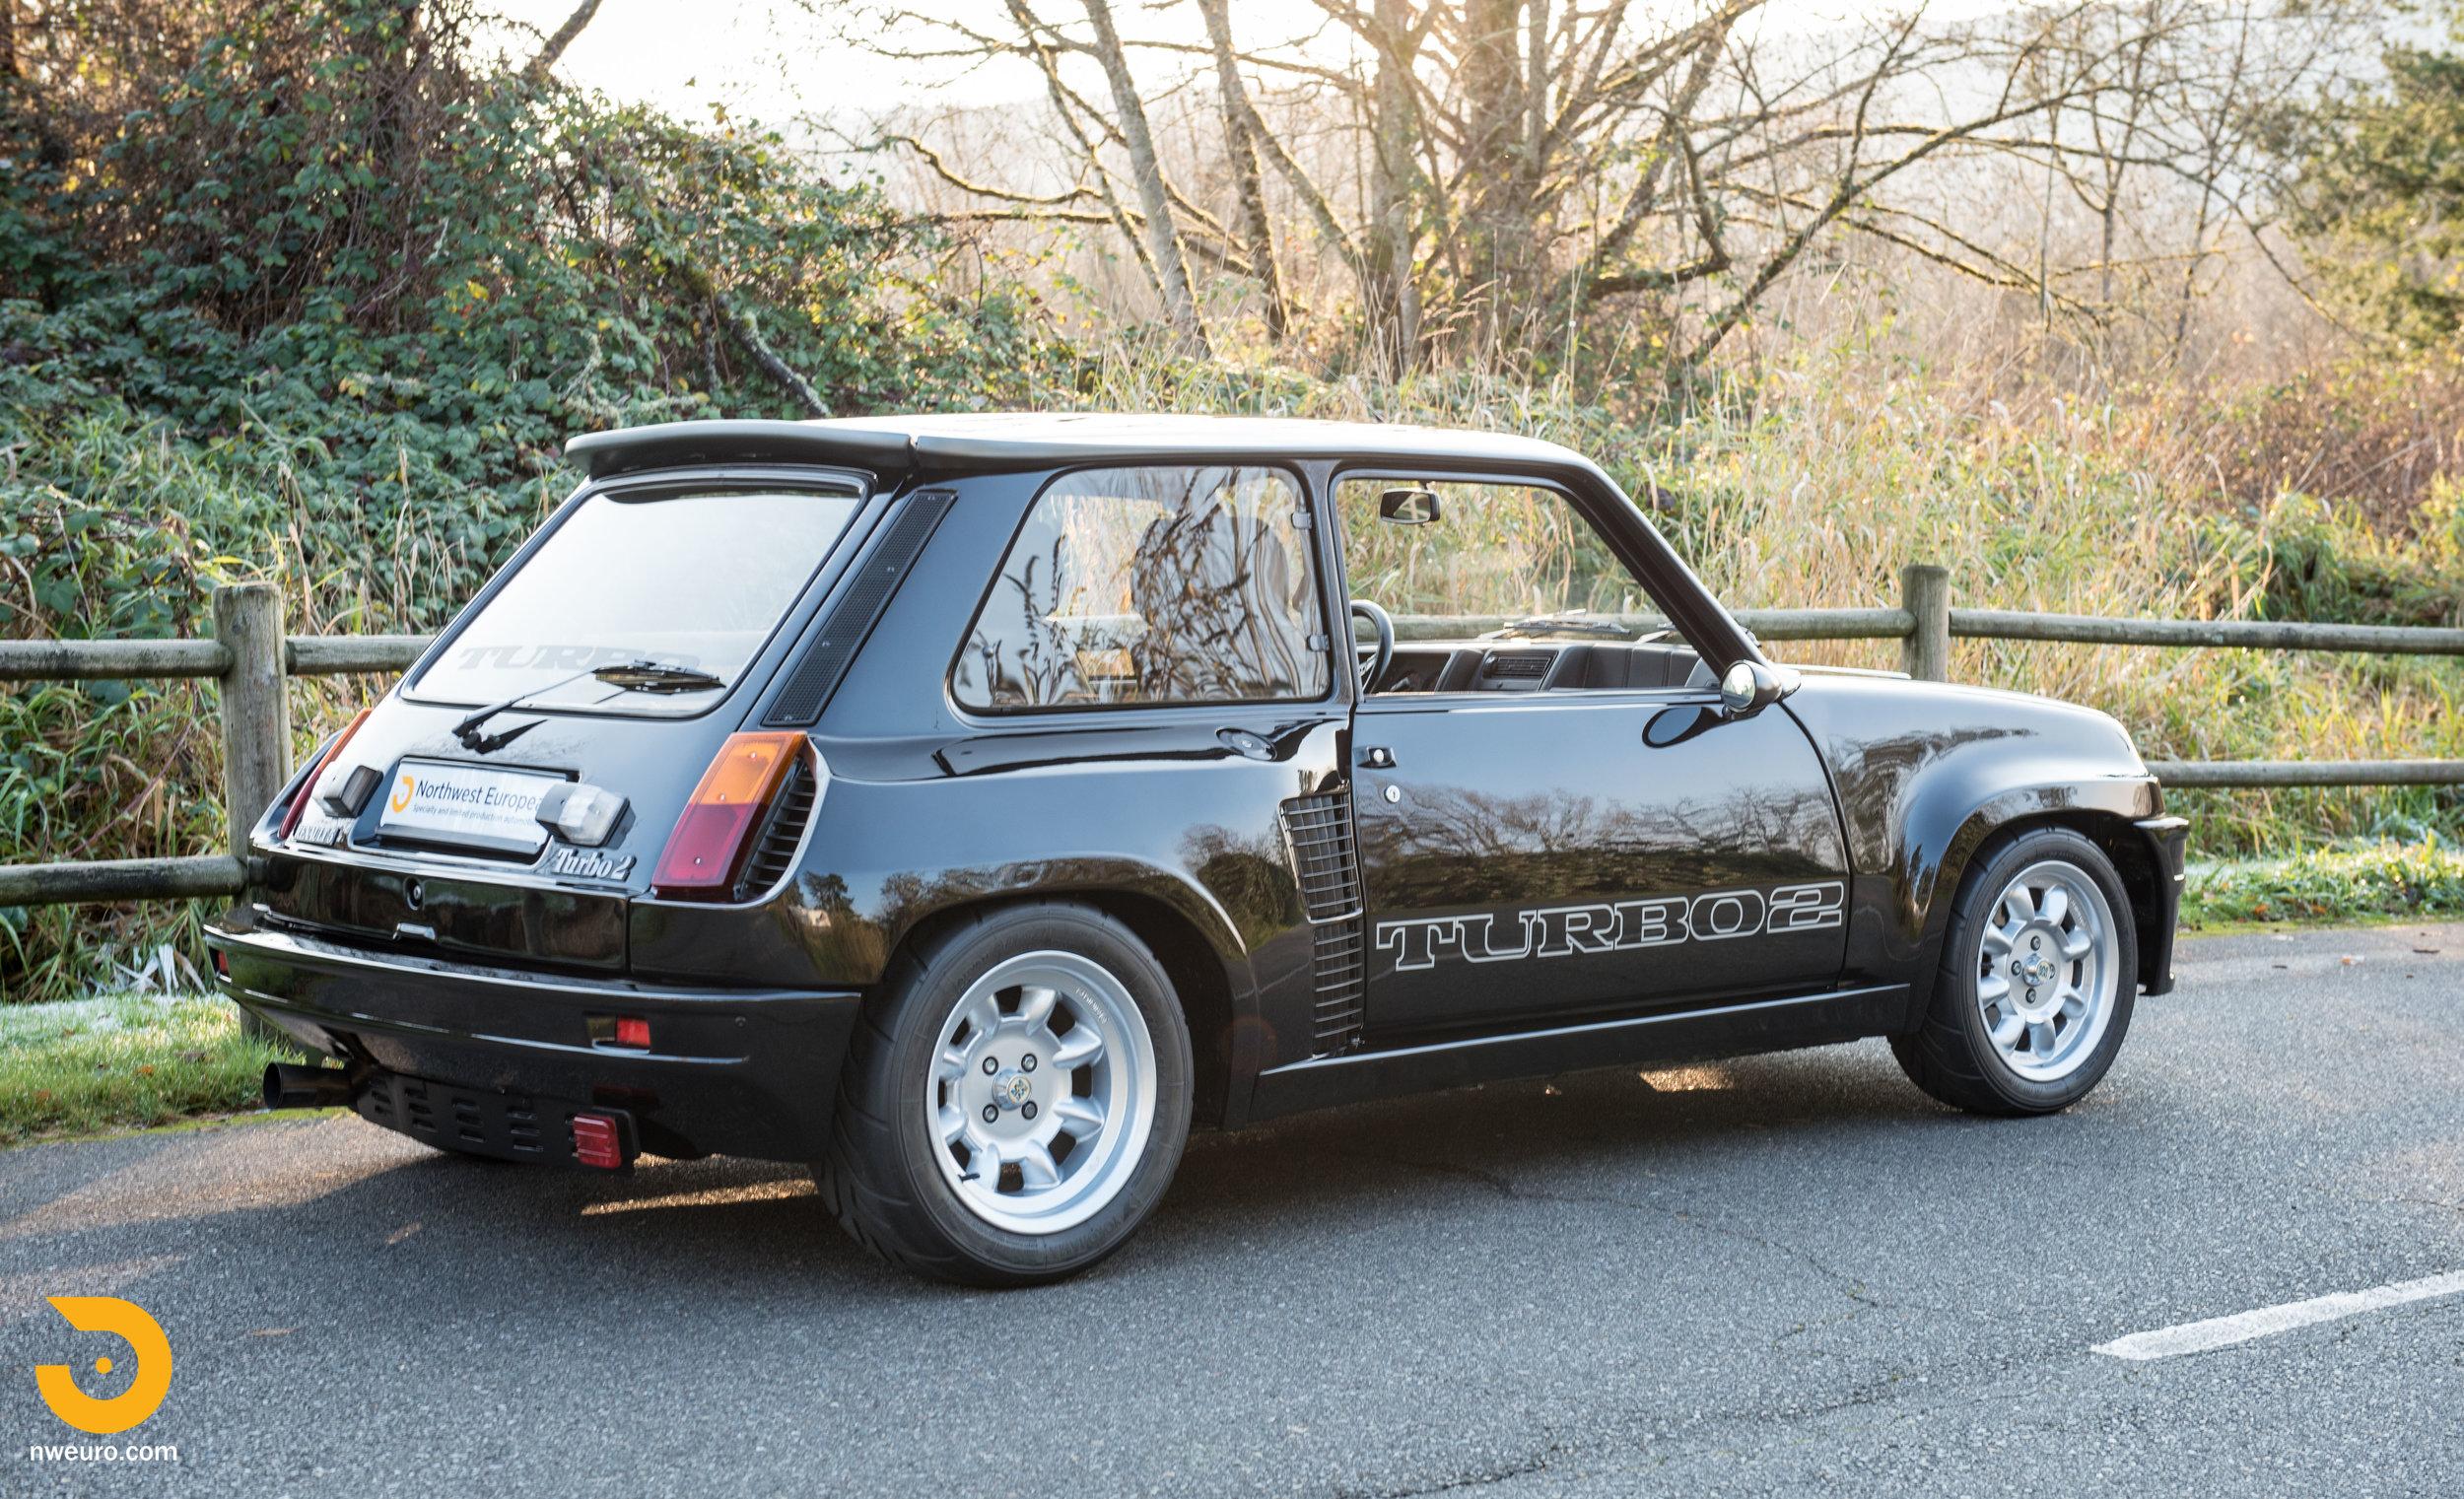 1983 Renault R5 Turbo 2 Black at Park-3.jpg